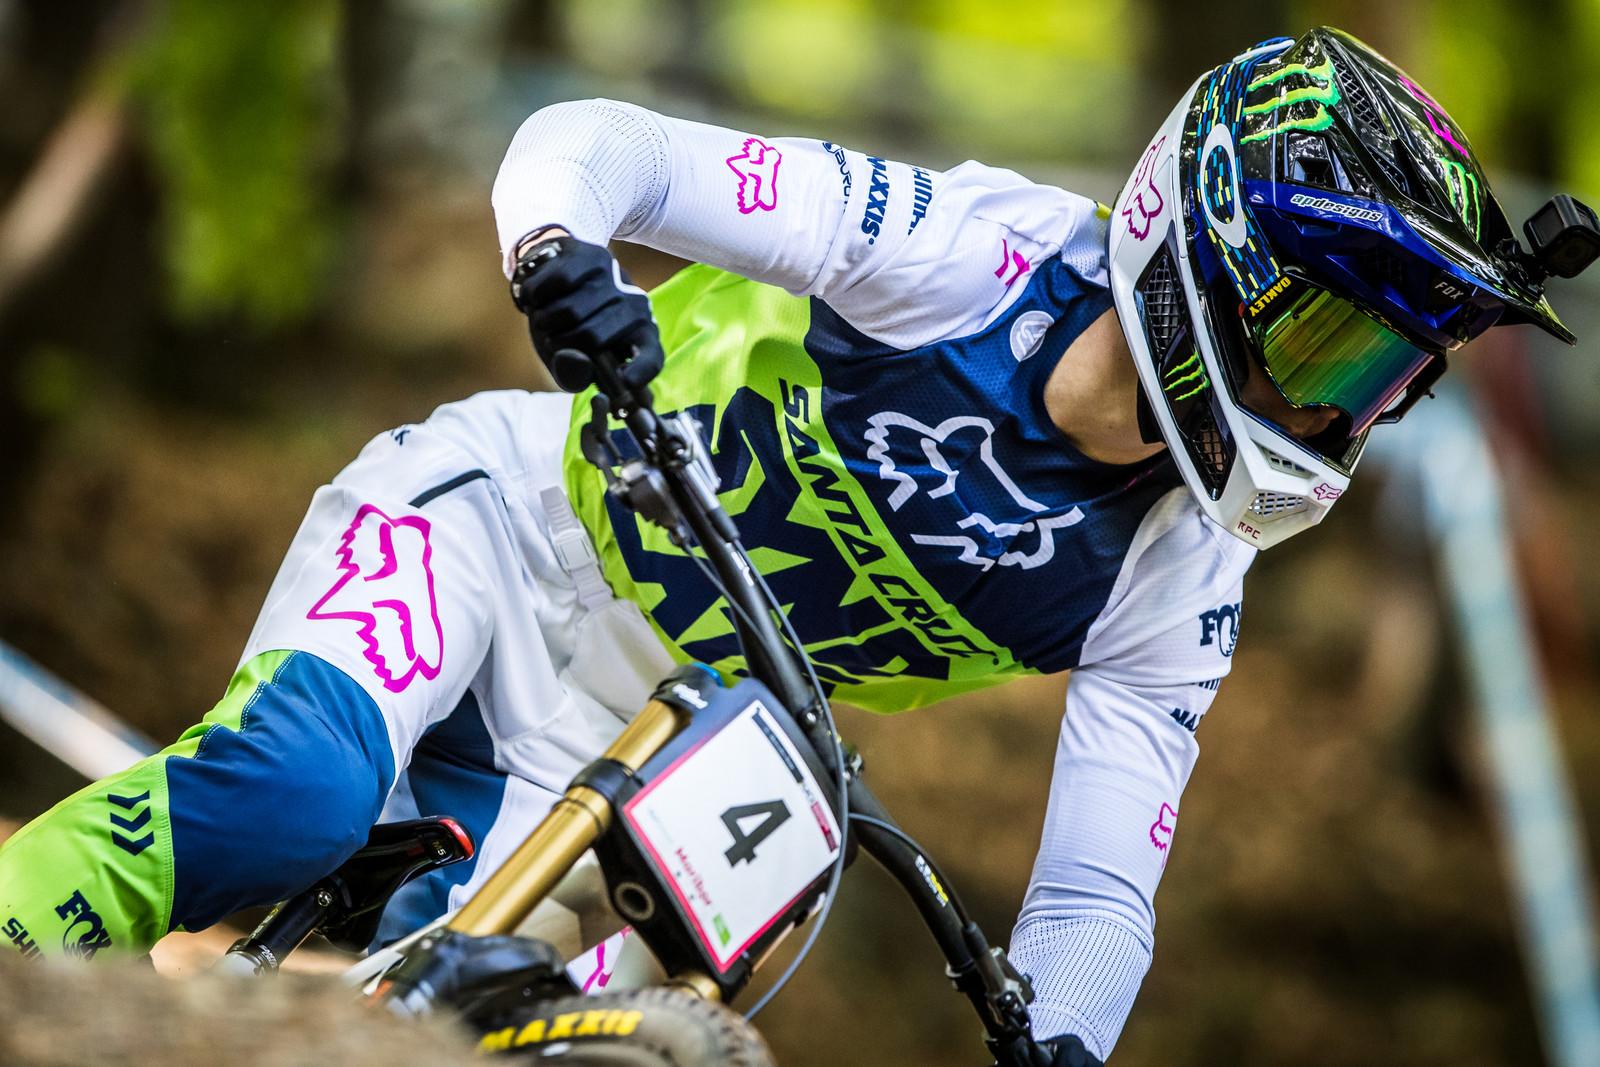 Poppin' Fresh Loris in Maribor - Loris Vergier 2019 World Cup Downhill Photos - Mountain Biking Pictures - Vital MTB